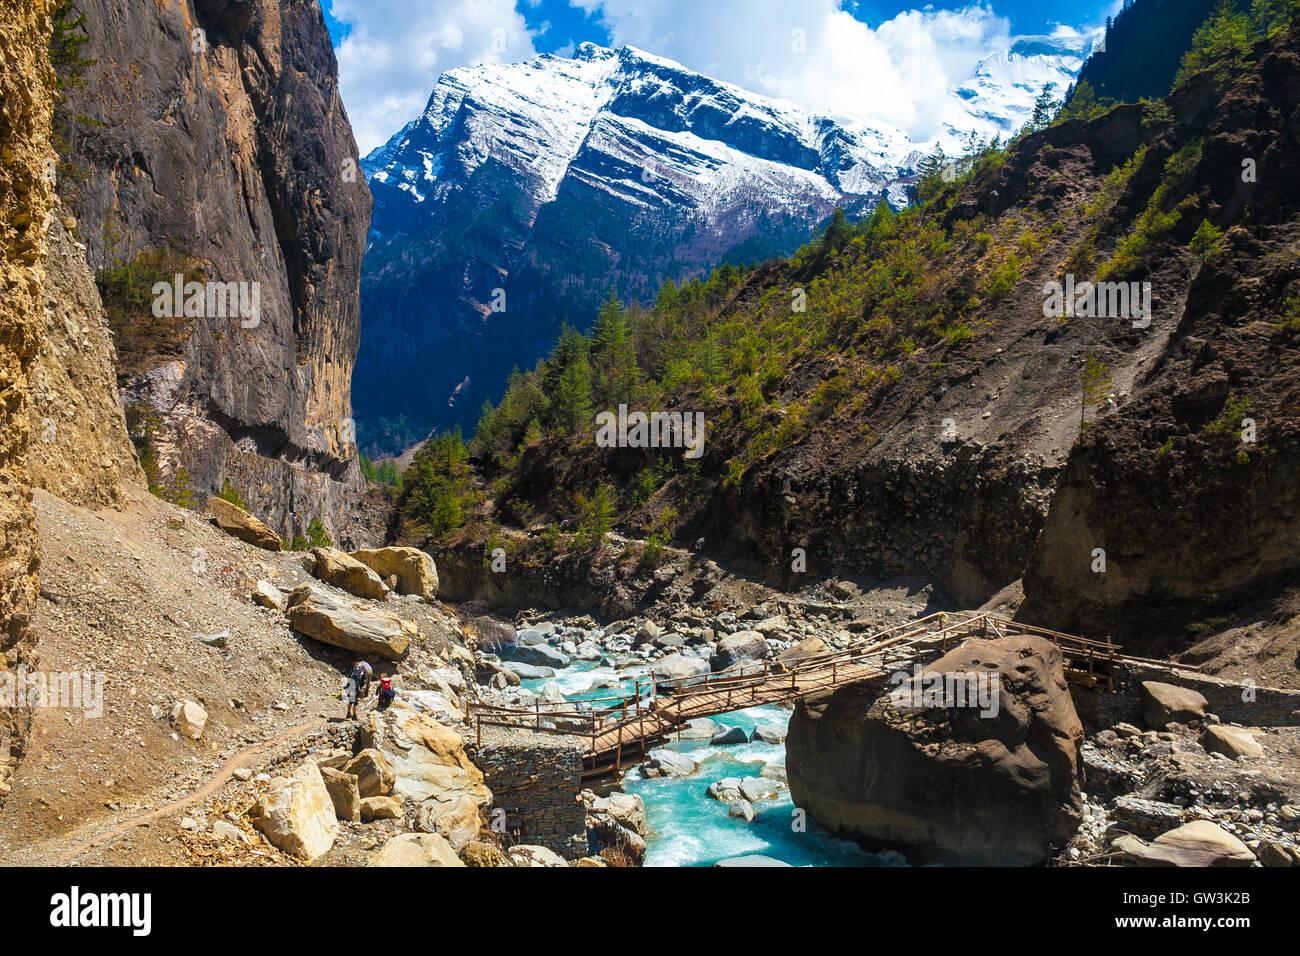 Landscape Fast Mountains River Hiking Himalayas.Beautiful View Wood Bridge End Summer Season Background.Green Threes - Stock Image